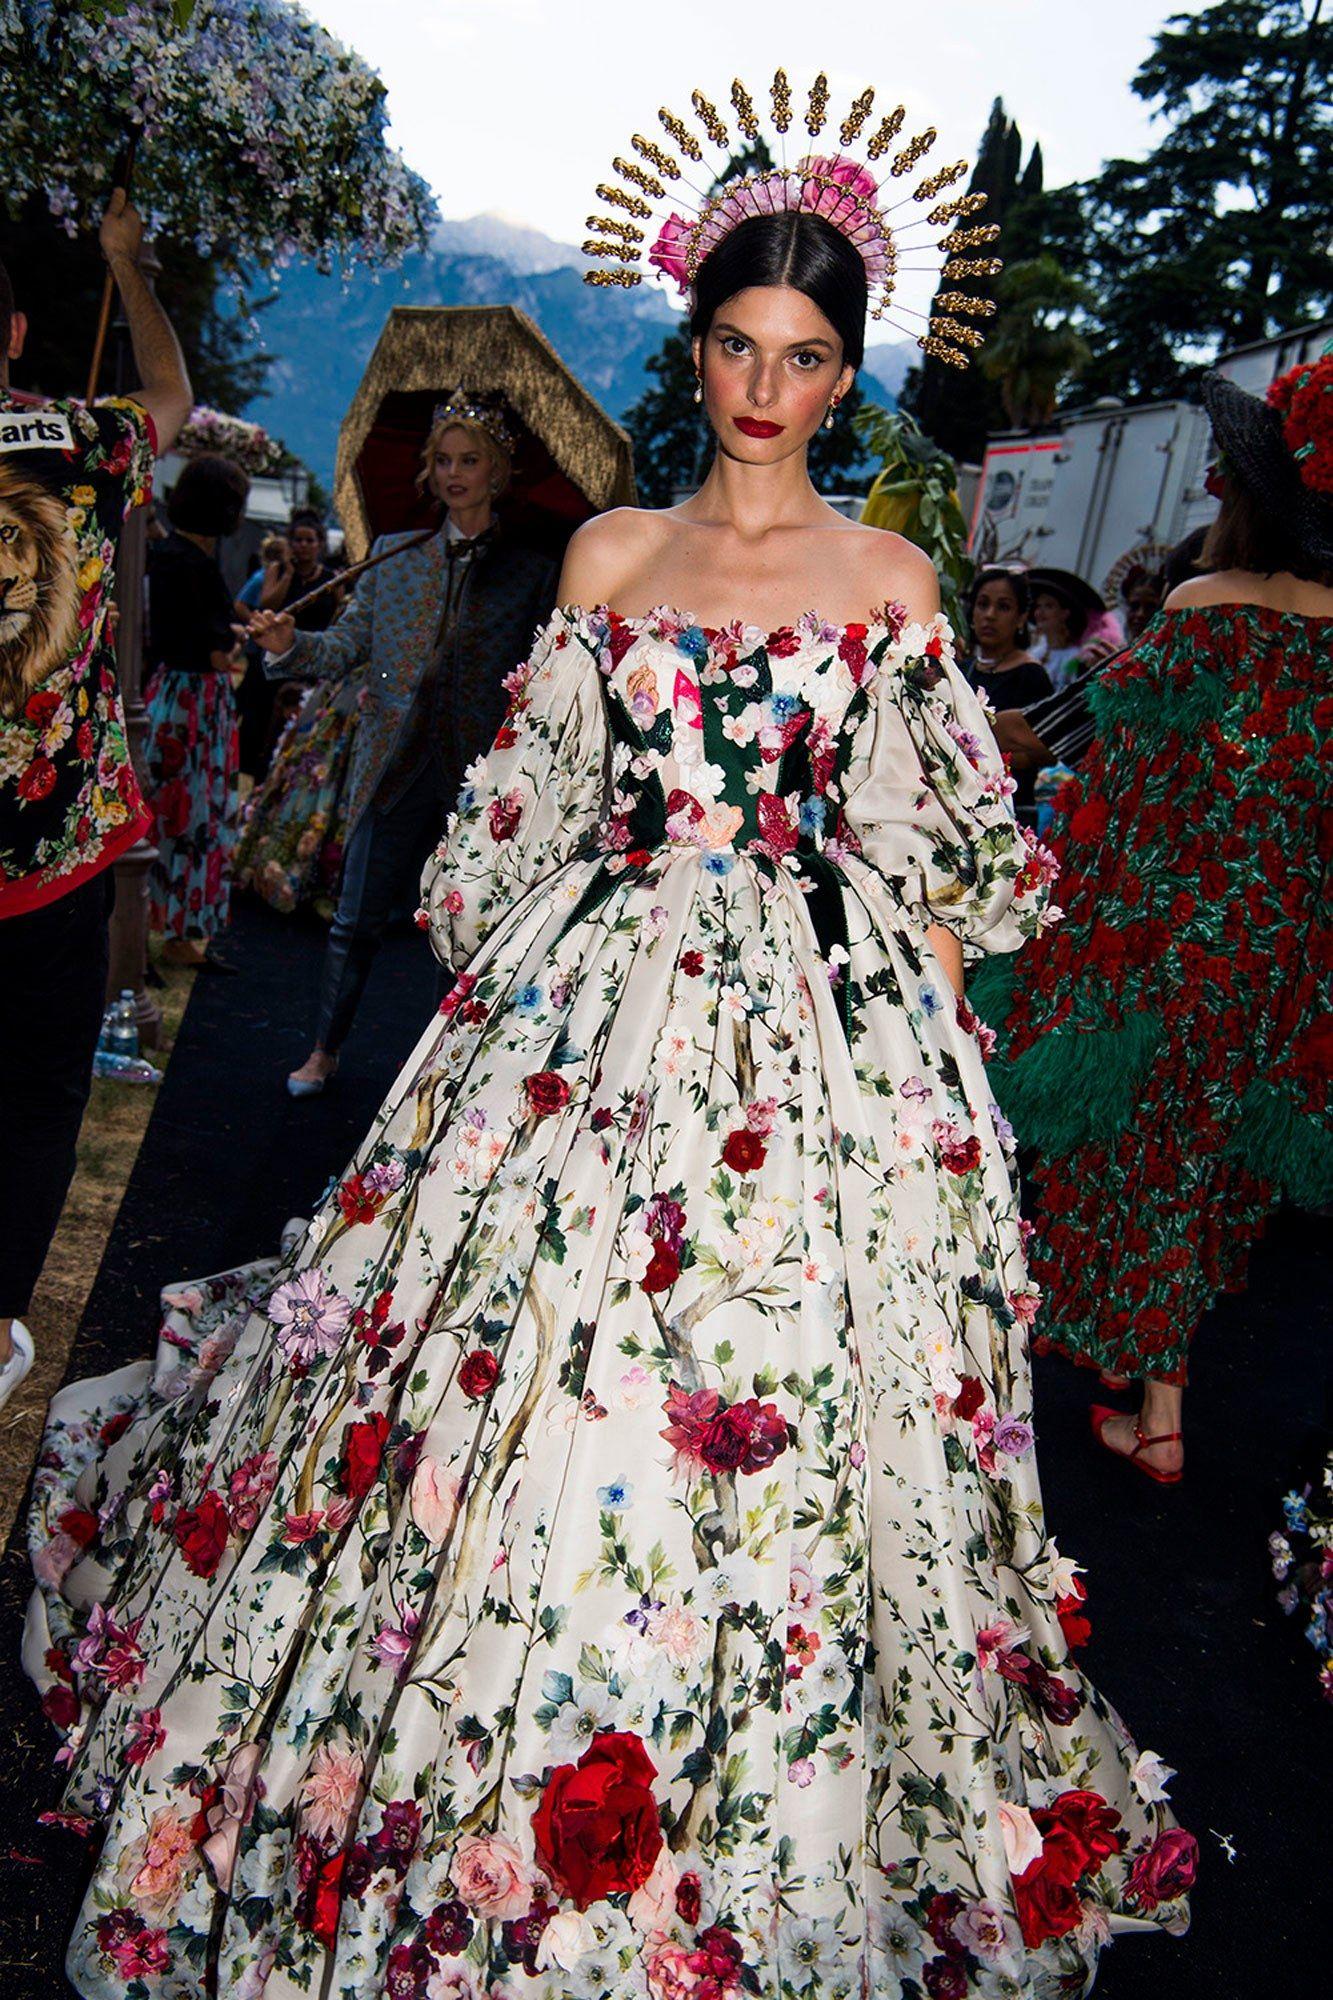 Dolce Gabbana S Como Chameleons Naomi Campbell Halima Aden And Maye Musk Model Alta Moda In Italy Fancy Dresses Fashion Beautiful Dresses